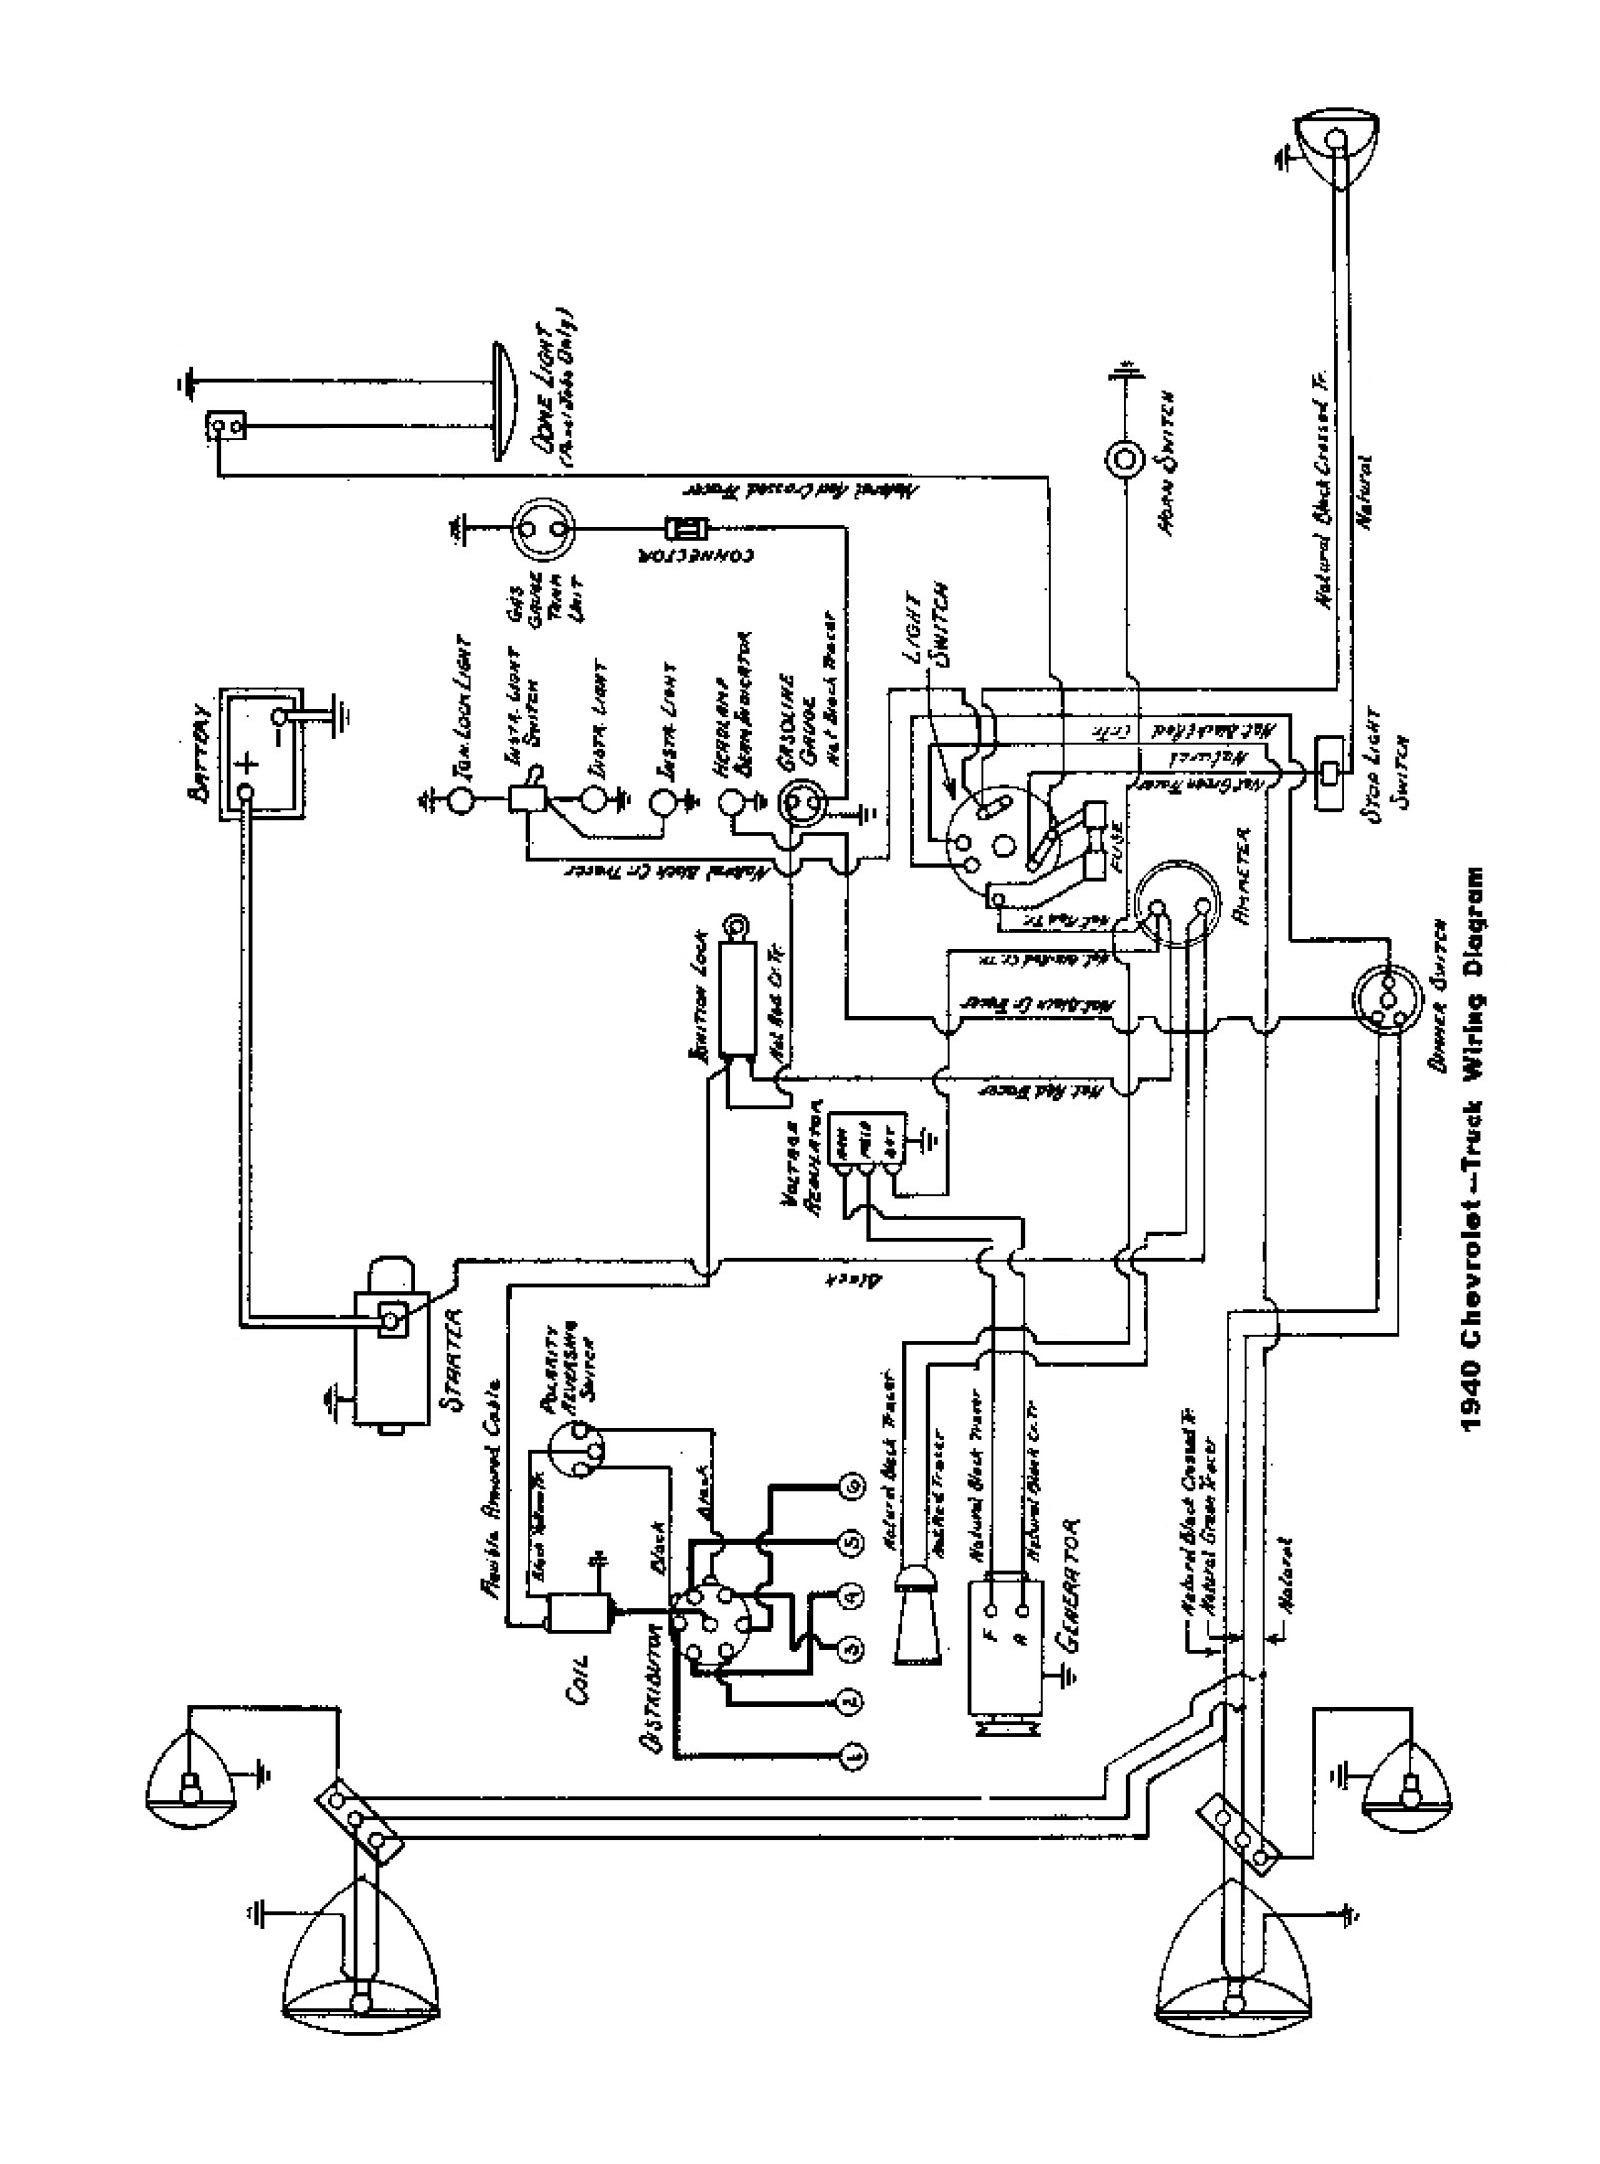 1951 olds wiring diagram wiring diagram info  1949 oldsmobile wiring harness wiring diagram inside 1951 olds wiring diagram